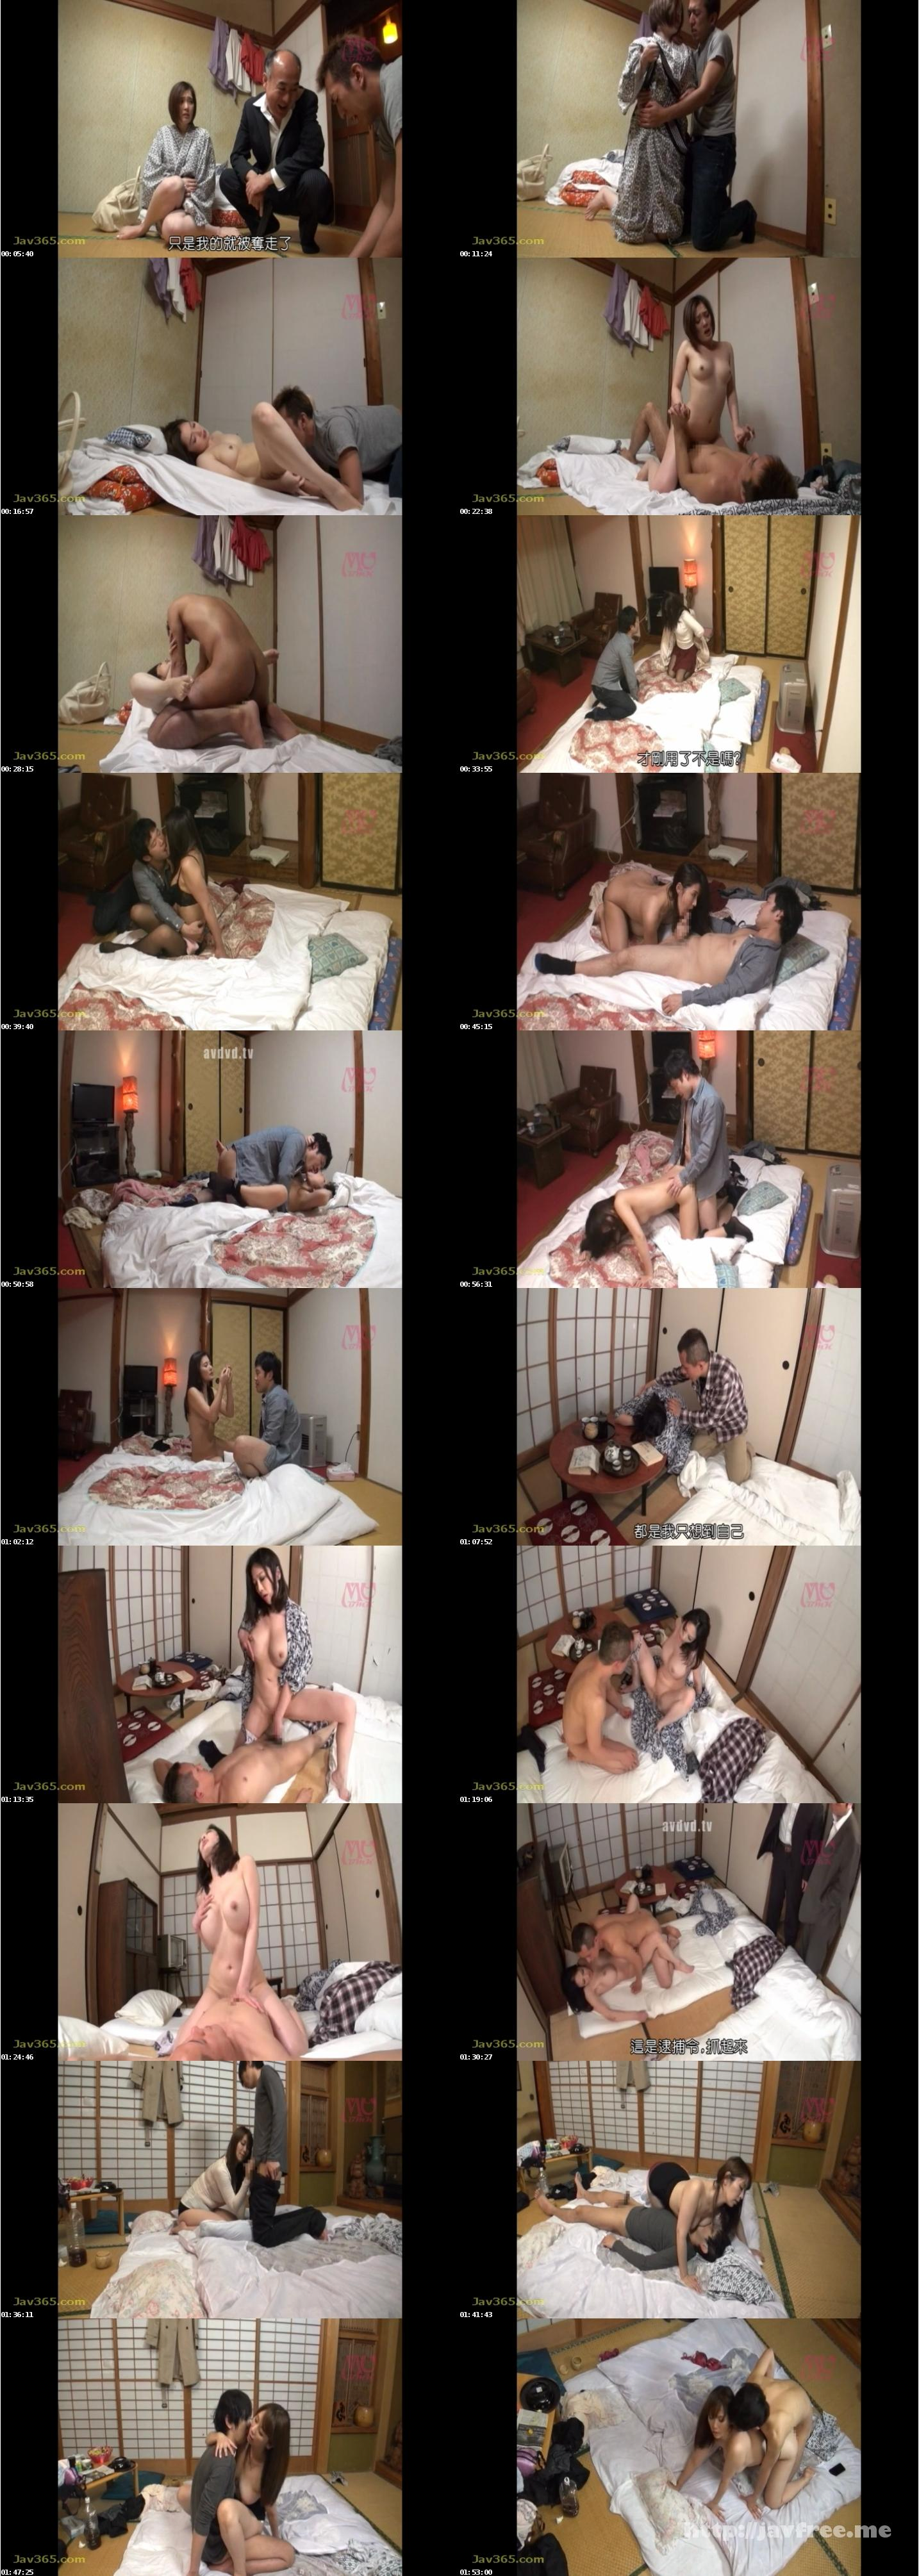 [UGUG-075] 愛では足りない!息子を独占したい…肉棒さえも! 逃亡中の母と息子が罪を重ねてまぐわう愛欲モーテル - image UGUG-075 on https://javfree.me